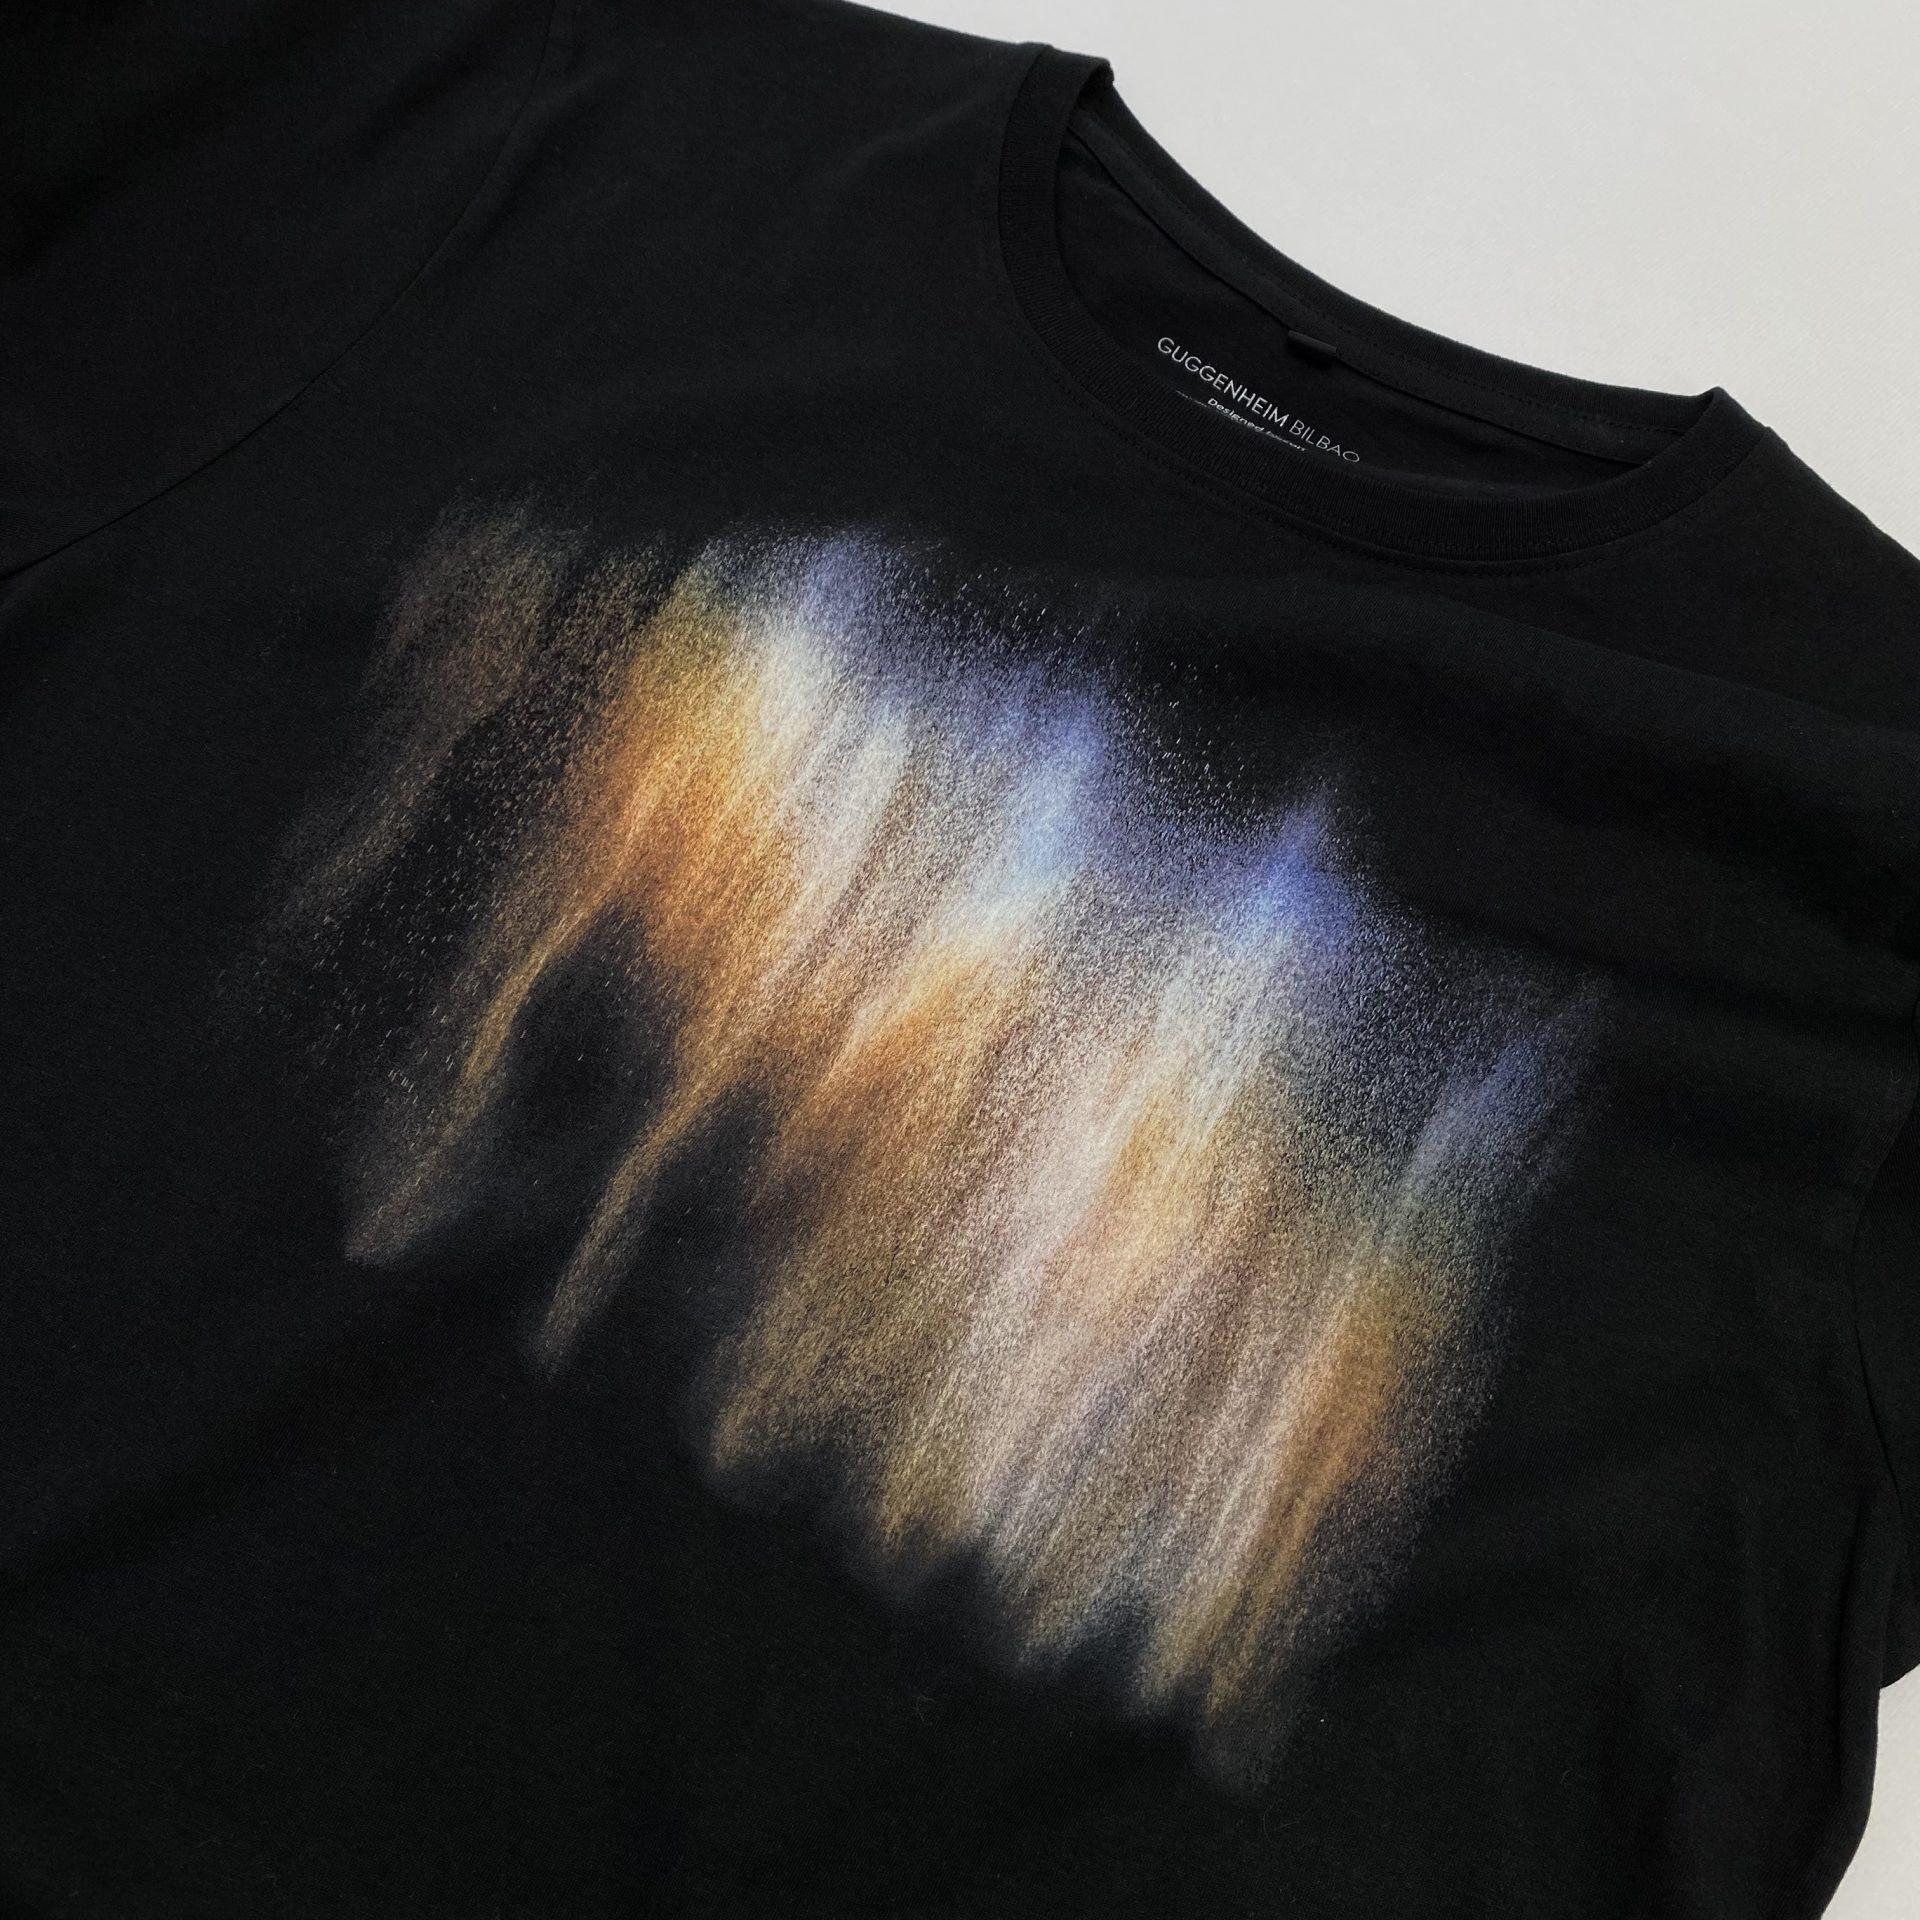 Guggenheim Bilbao Eliasson t-shirt print on demand